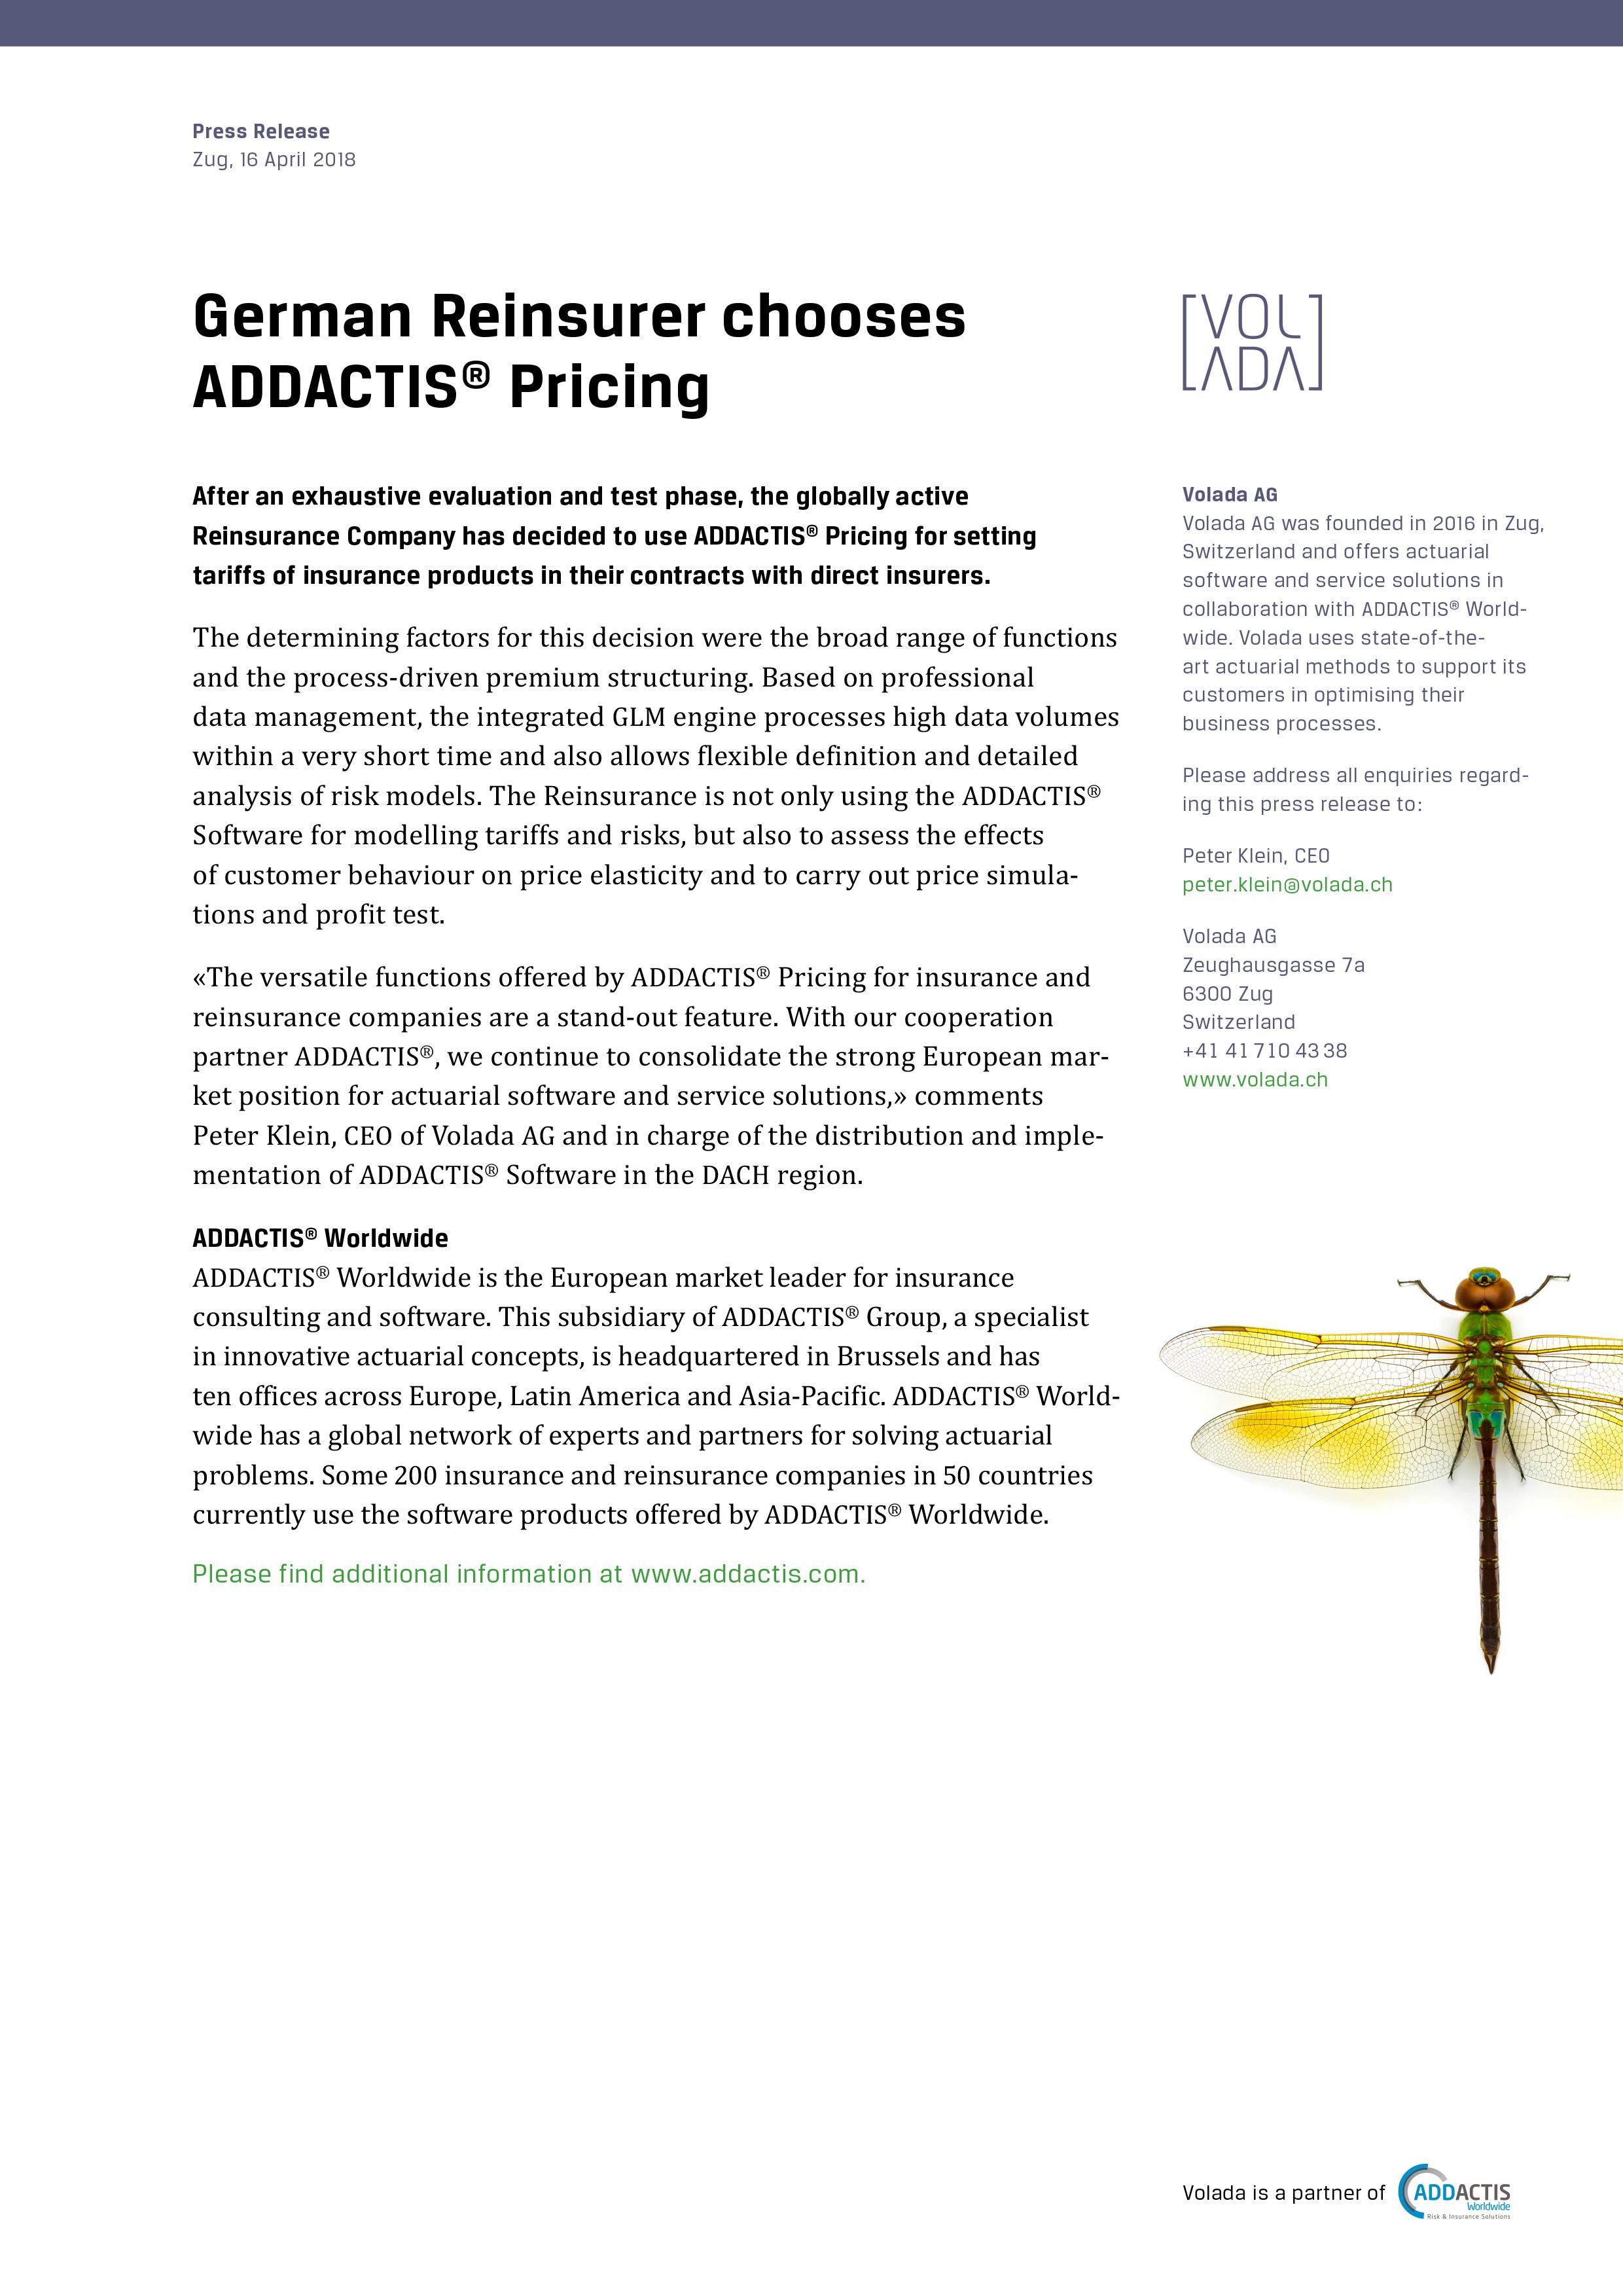 Volada German Reinsurer Chooses addactis® Pricing Press Release